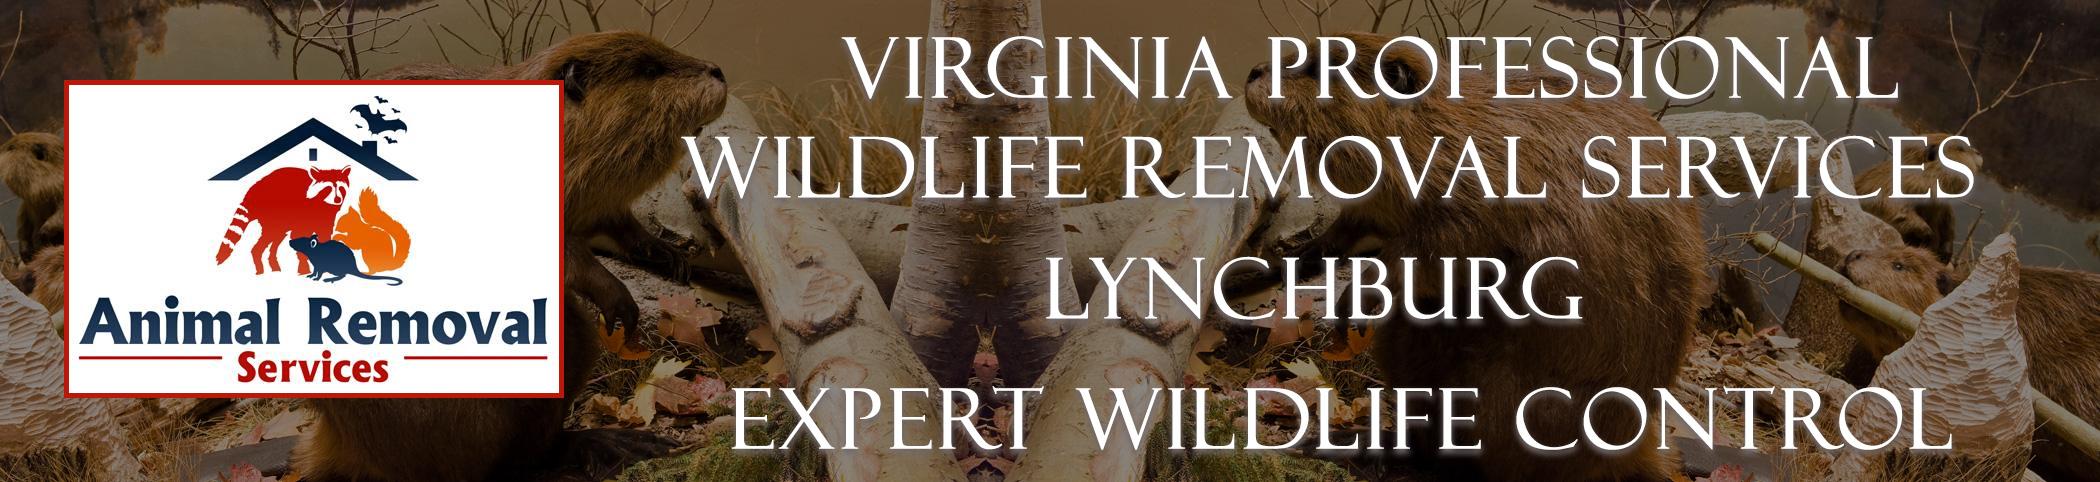 Virginia-Professional-Wildlife-Removal-Services-Lynchburg